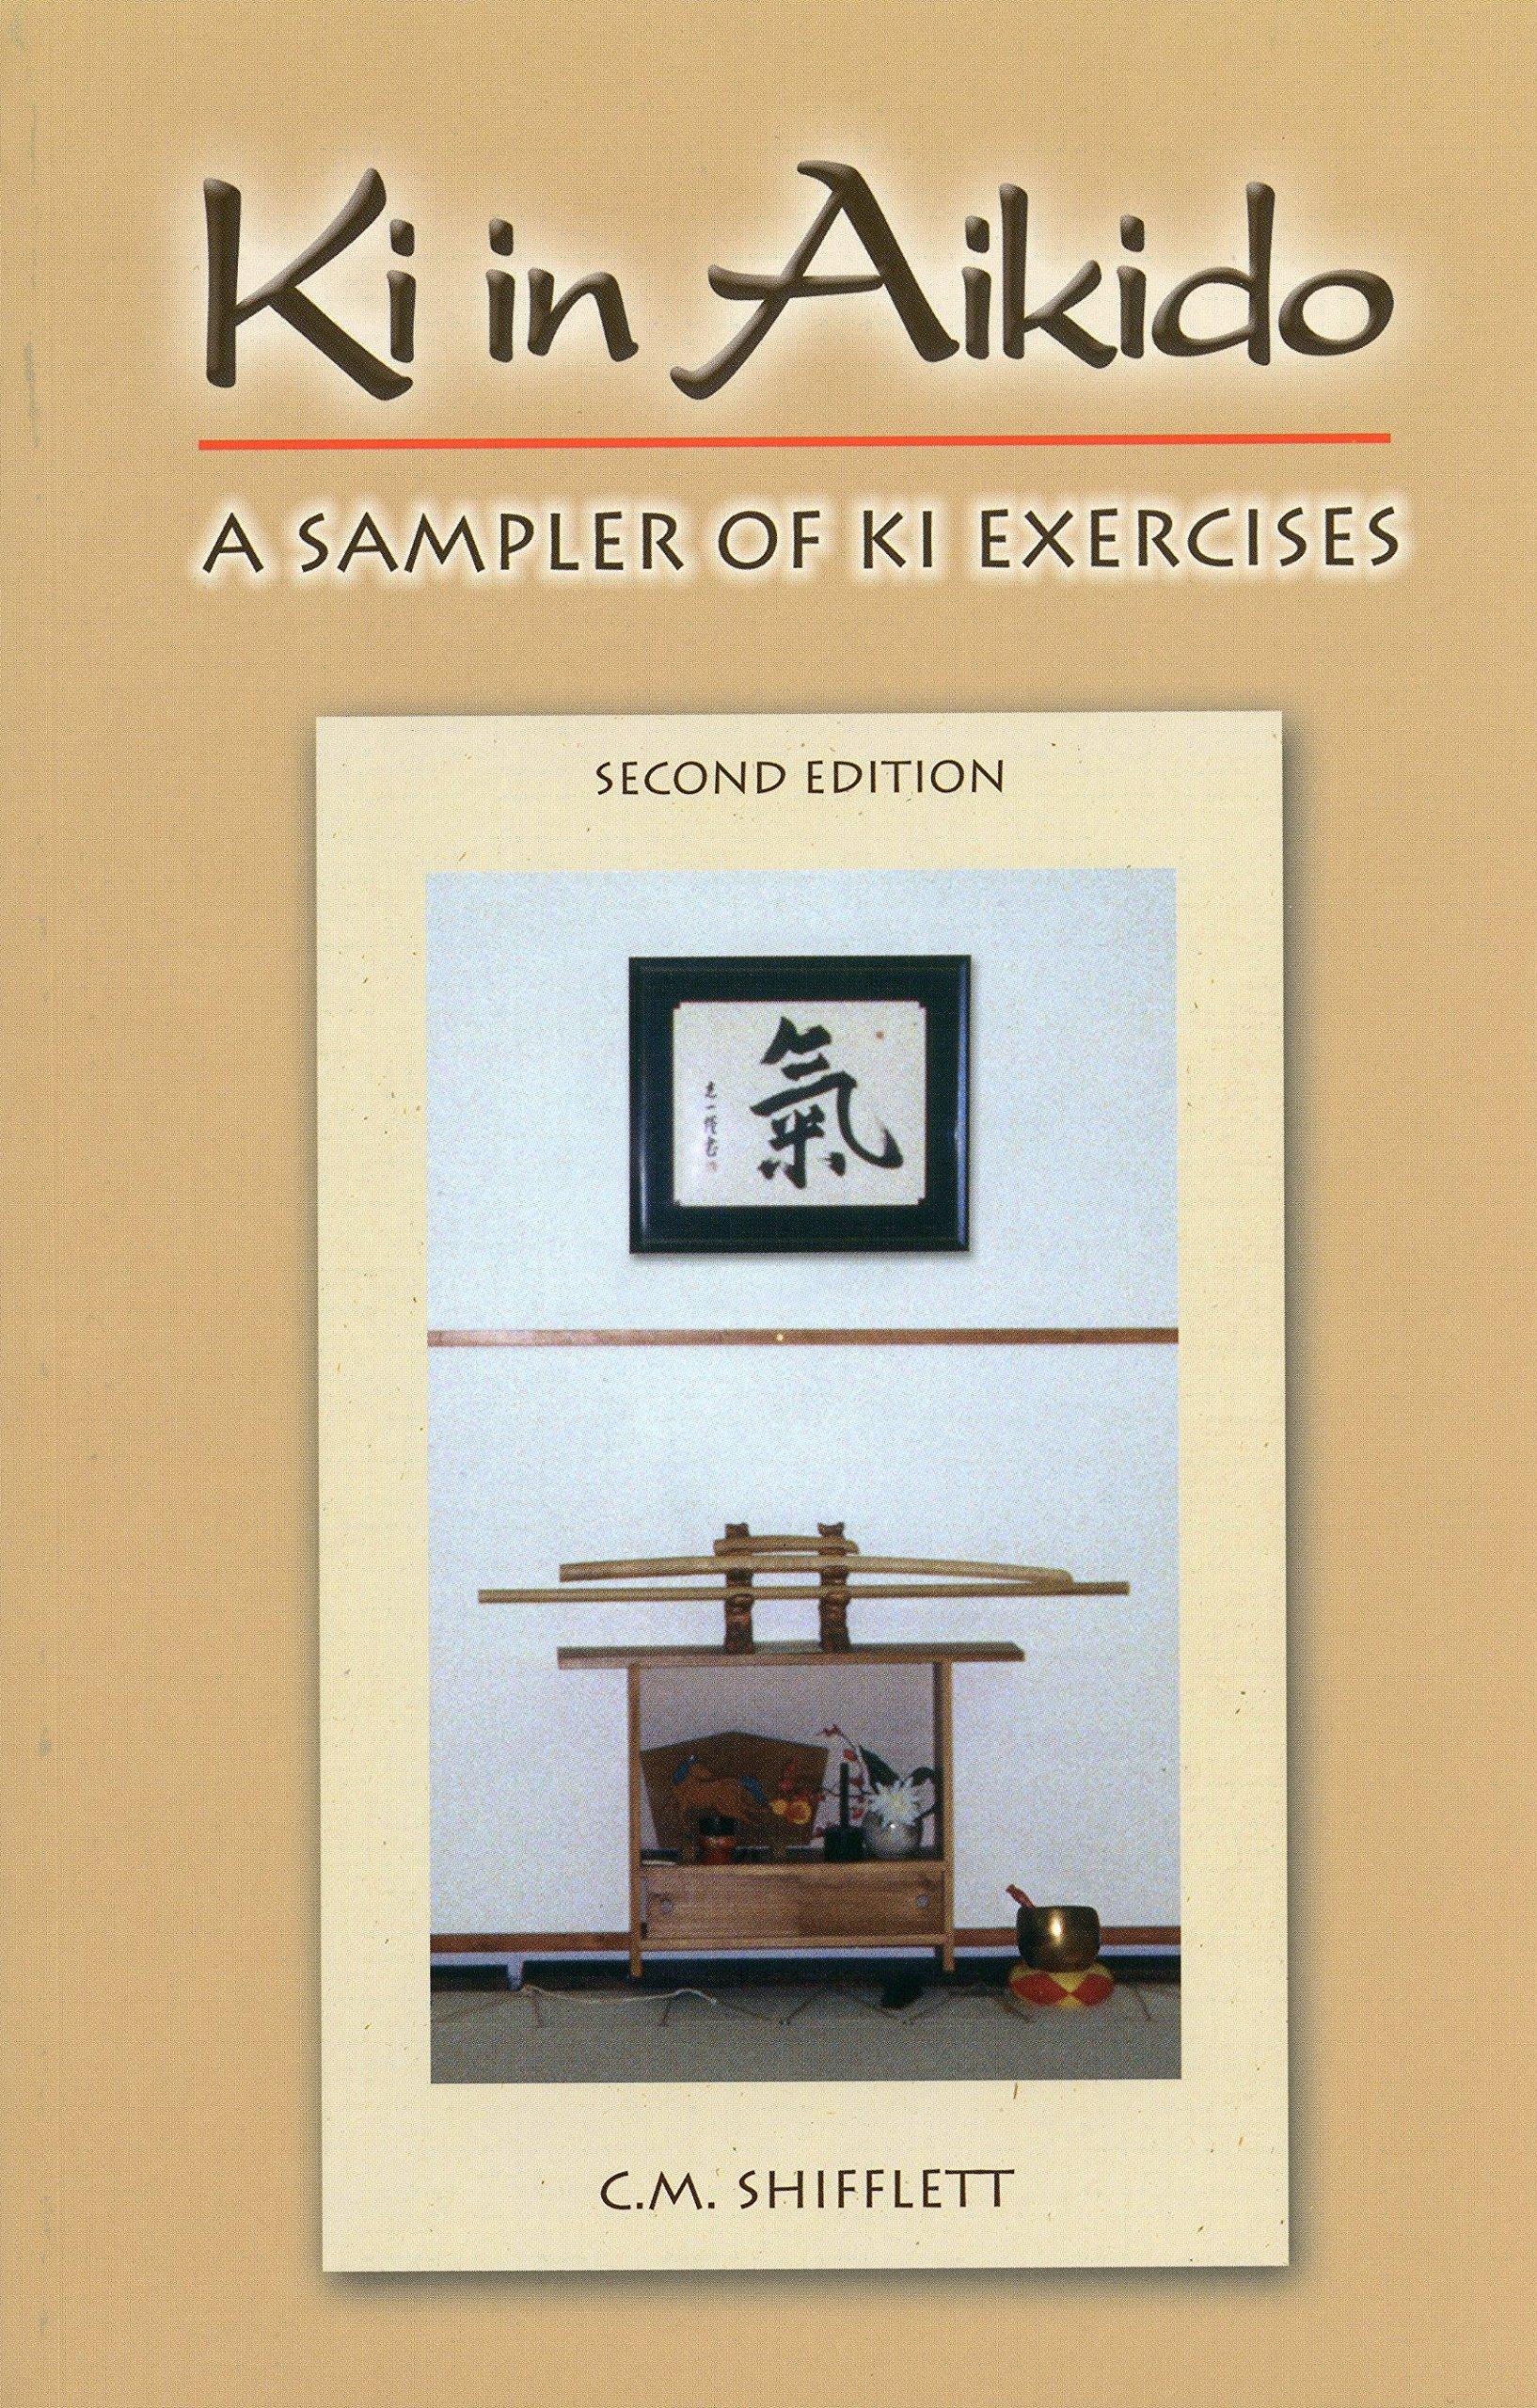 Ki in Aikido, Second Edition: A Sampler of Ki Exercises